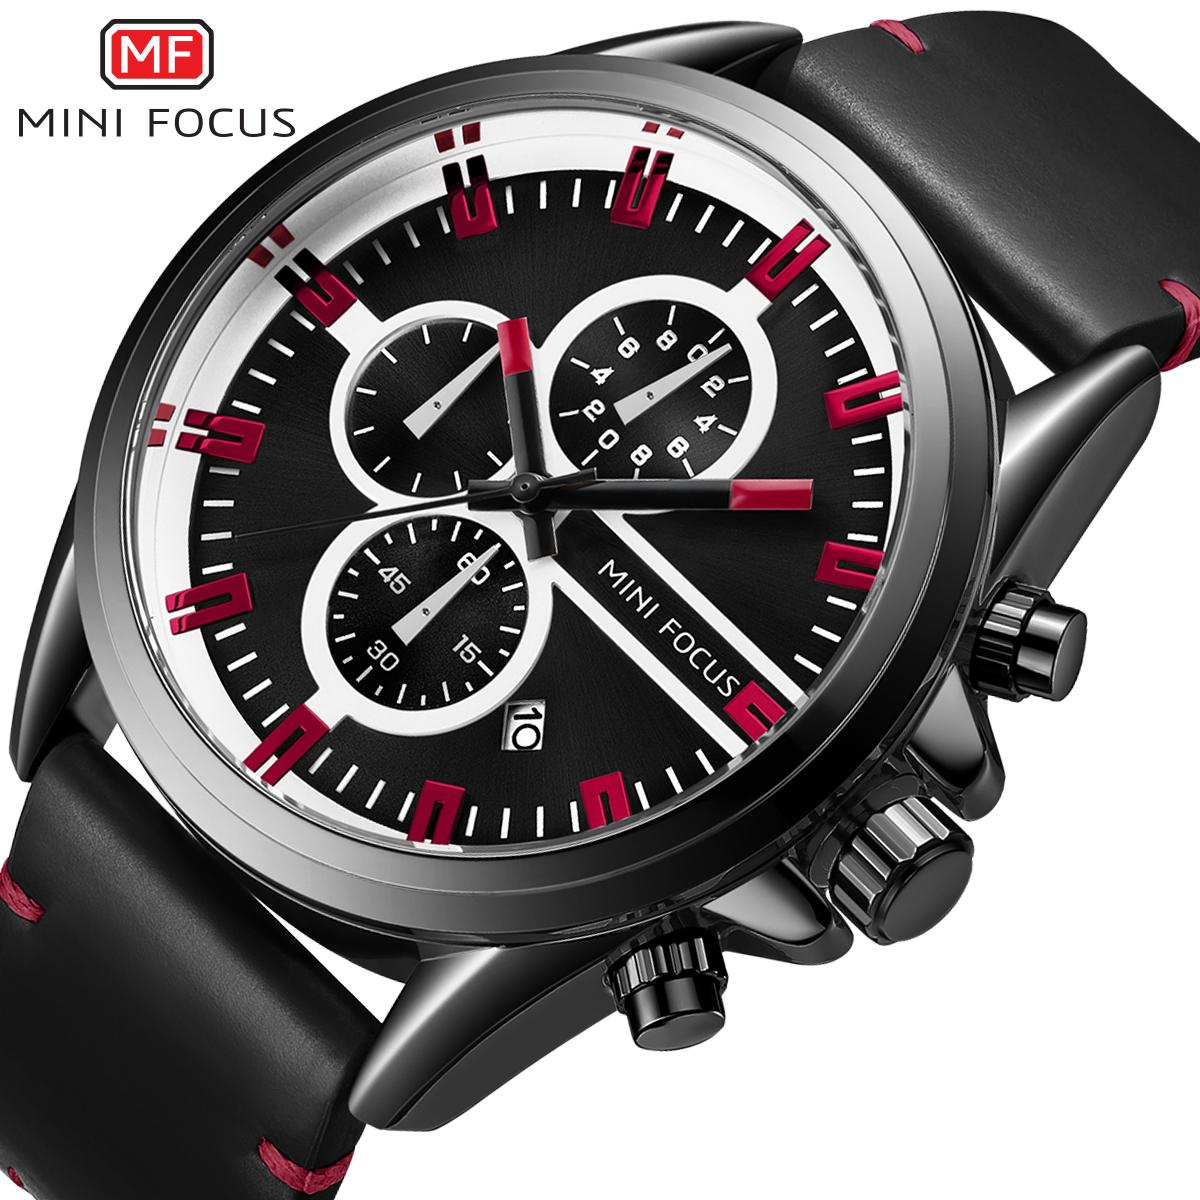 31146c2ddc0 Compre MINI FOCO Único Relógio De Quartzo Moda Homens Pulseira De Couro  Multifuncional Mens Relógios Contraste Cor Roxo Índice Top Design Da Marca  De ...